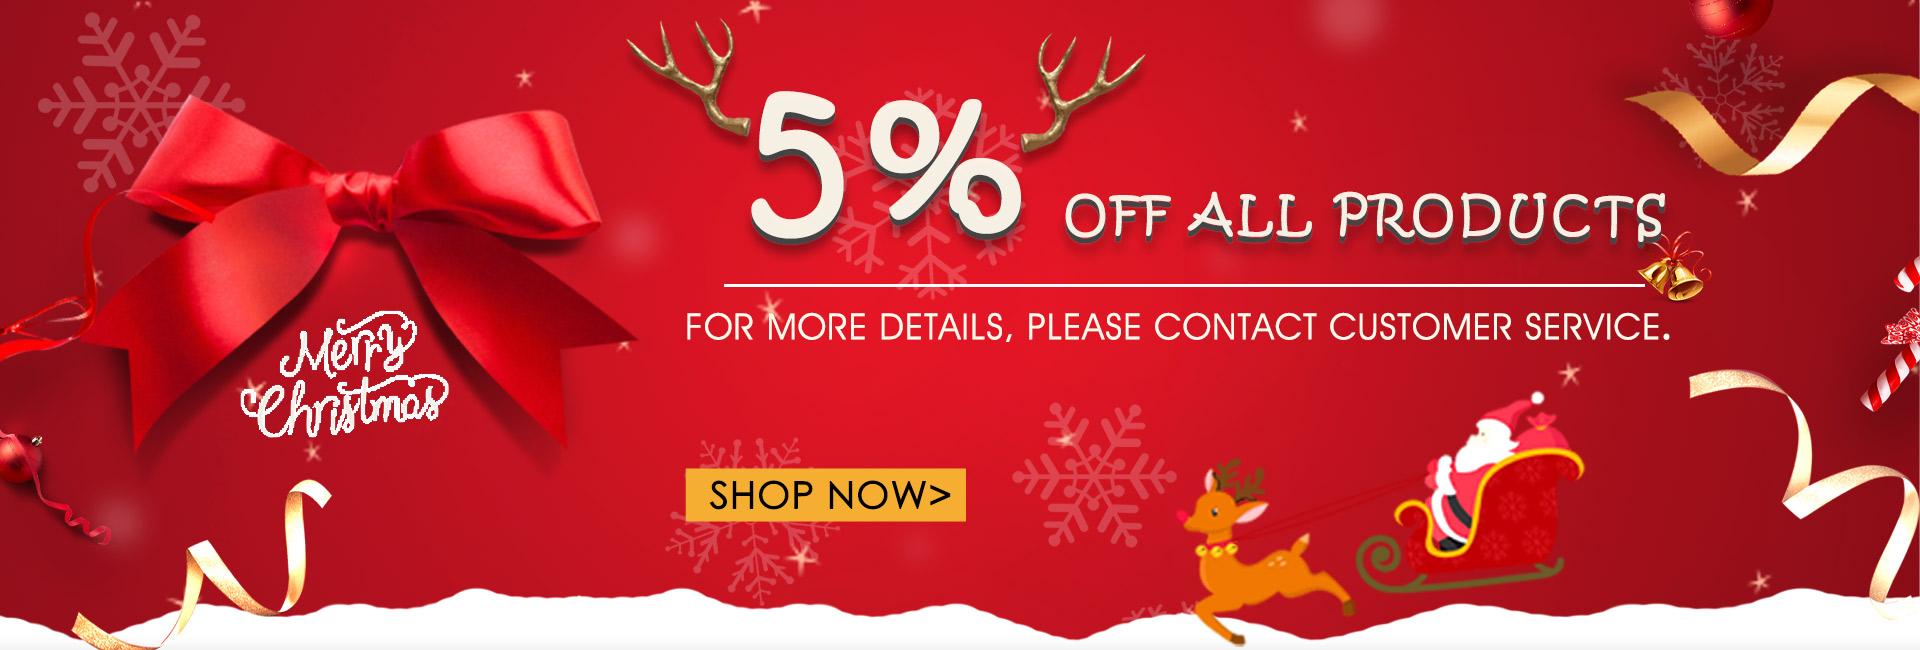 5% Off Hot Selling Gold Velg Luxe Keramische Fijne Bone China Servies Diner Set